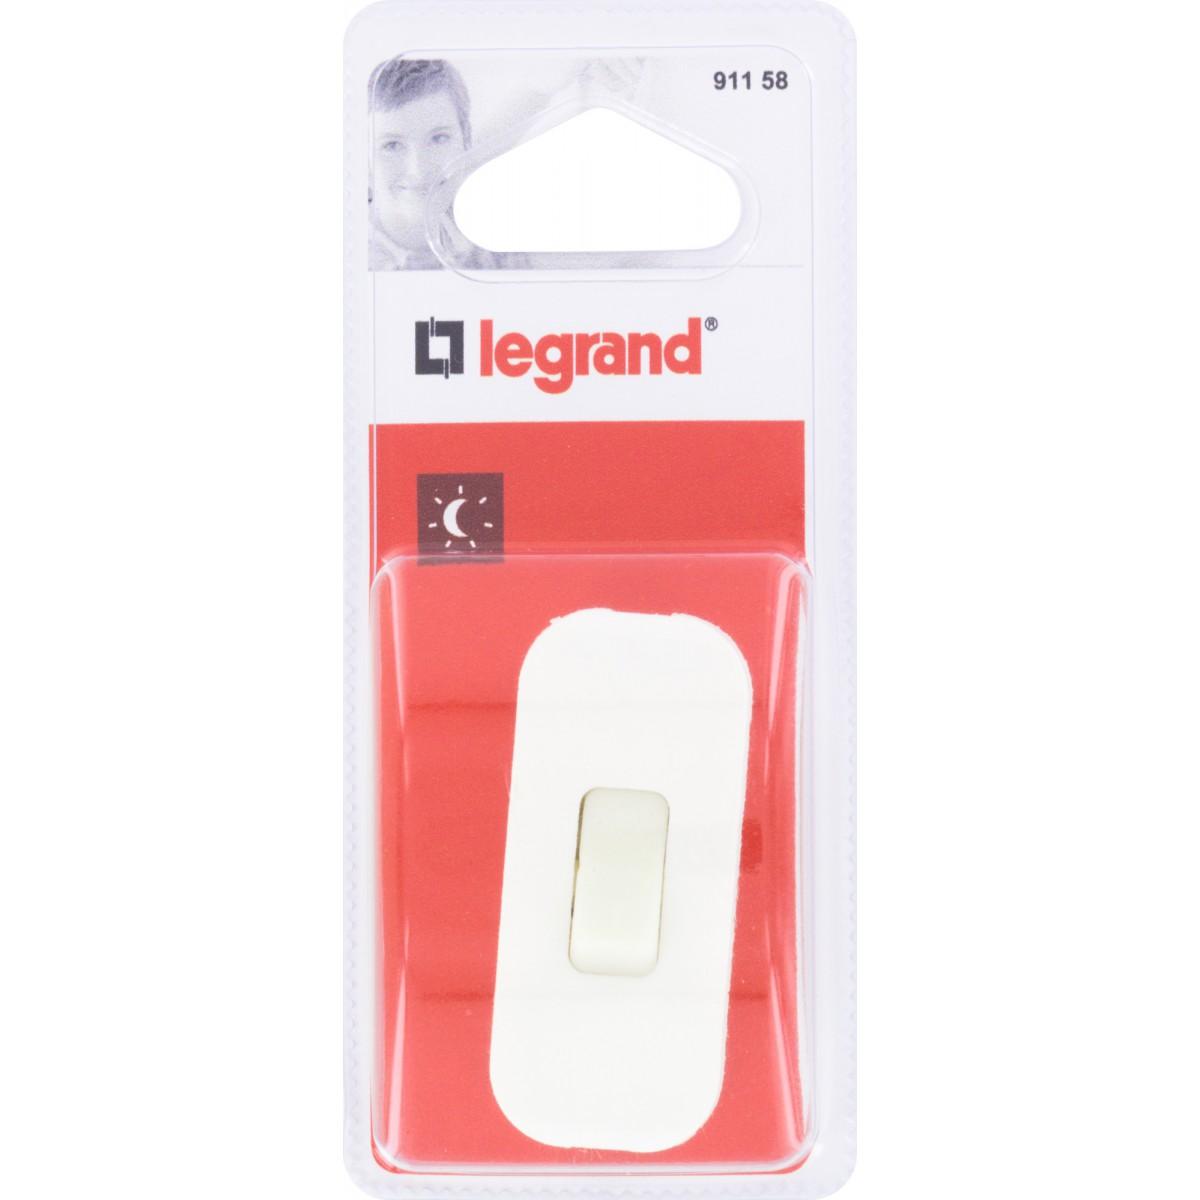 Interrupteur de fil souple 2A touche luminescente Legrand - Blanc